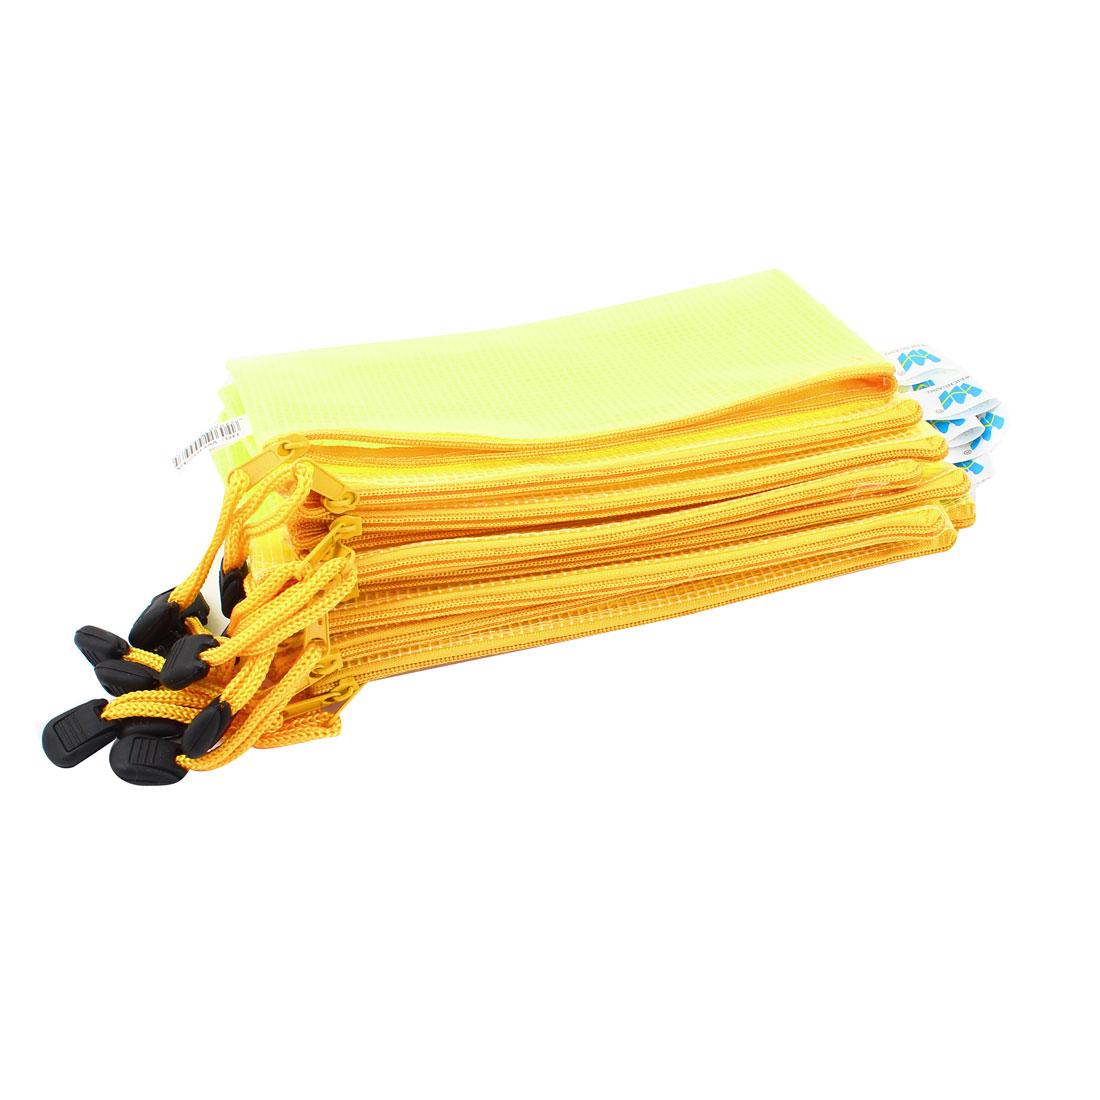 12 Pcs 18.5 x 11cm Student Office Zip Up Mesh Plastic File Storage Bag Yellow